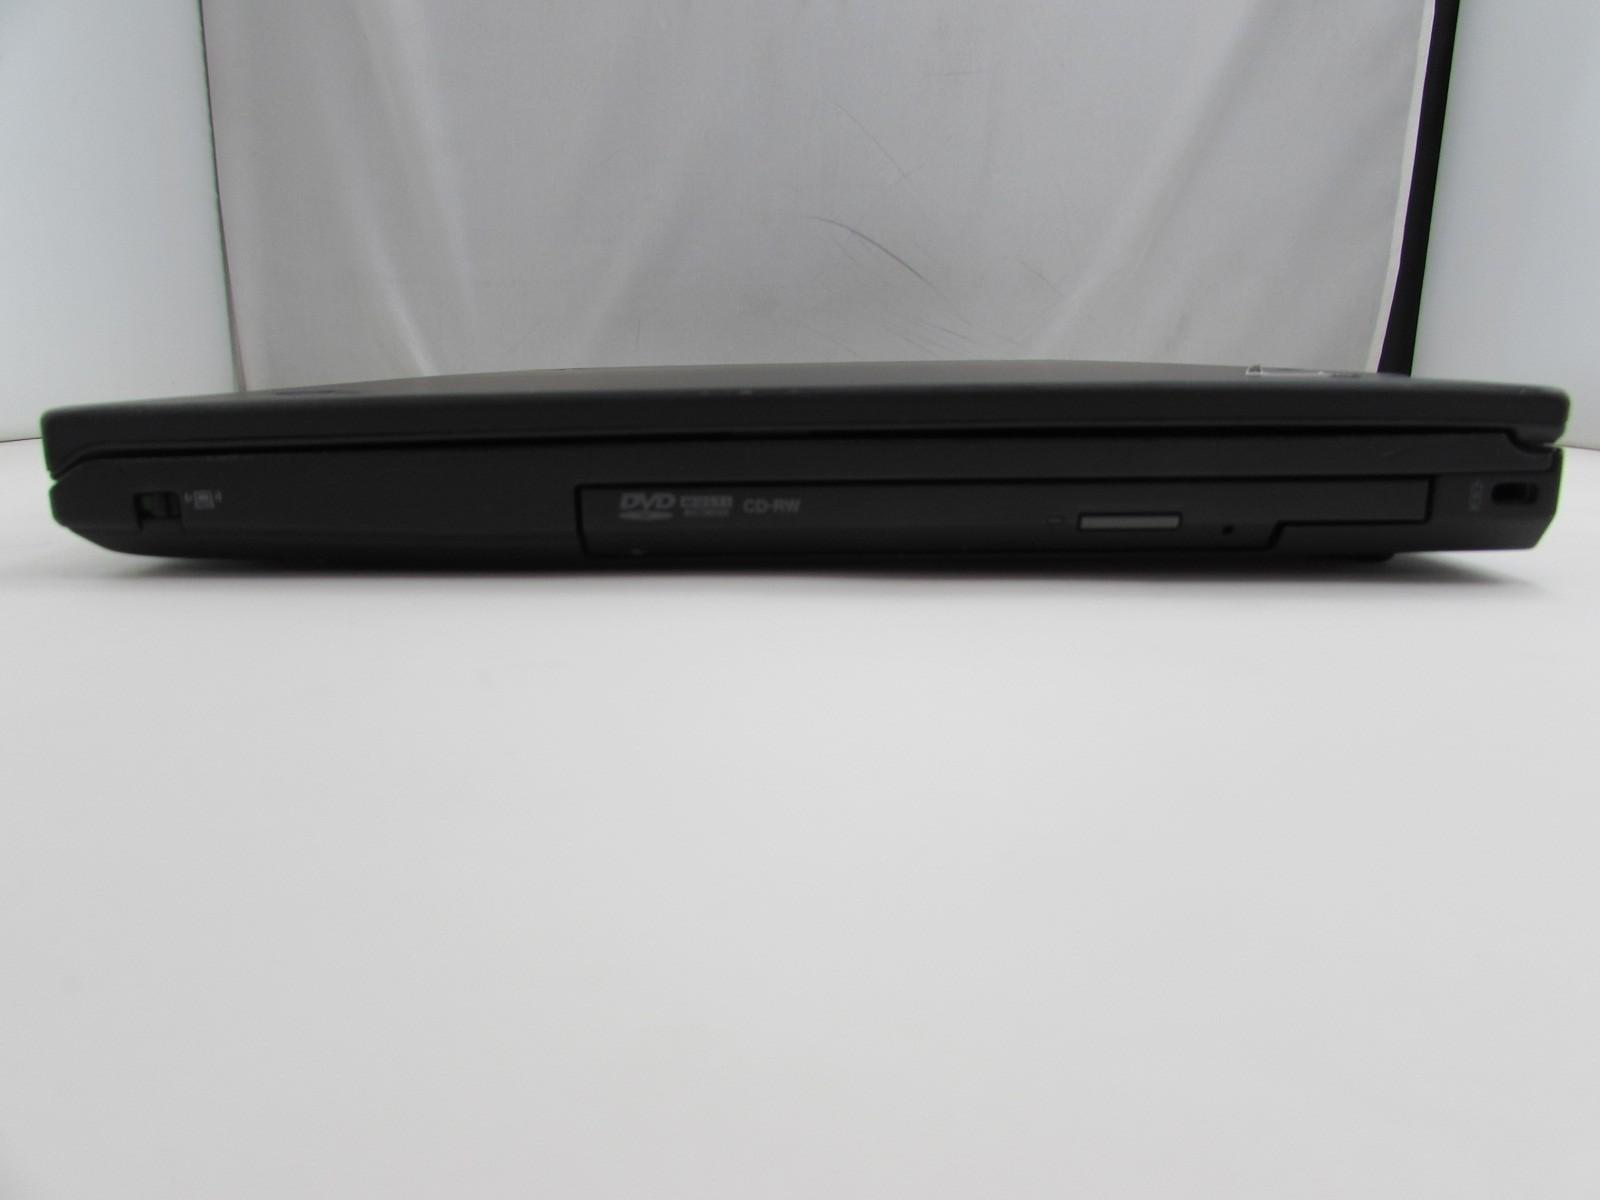 Lenovo T420s Drivers Windows 7 - Tsstcorp Cddvdw Sn 208dn Driver